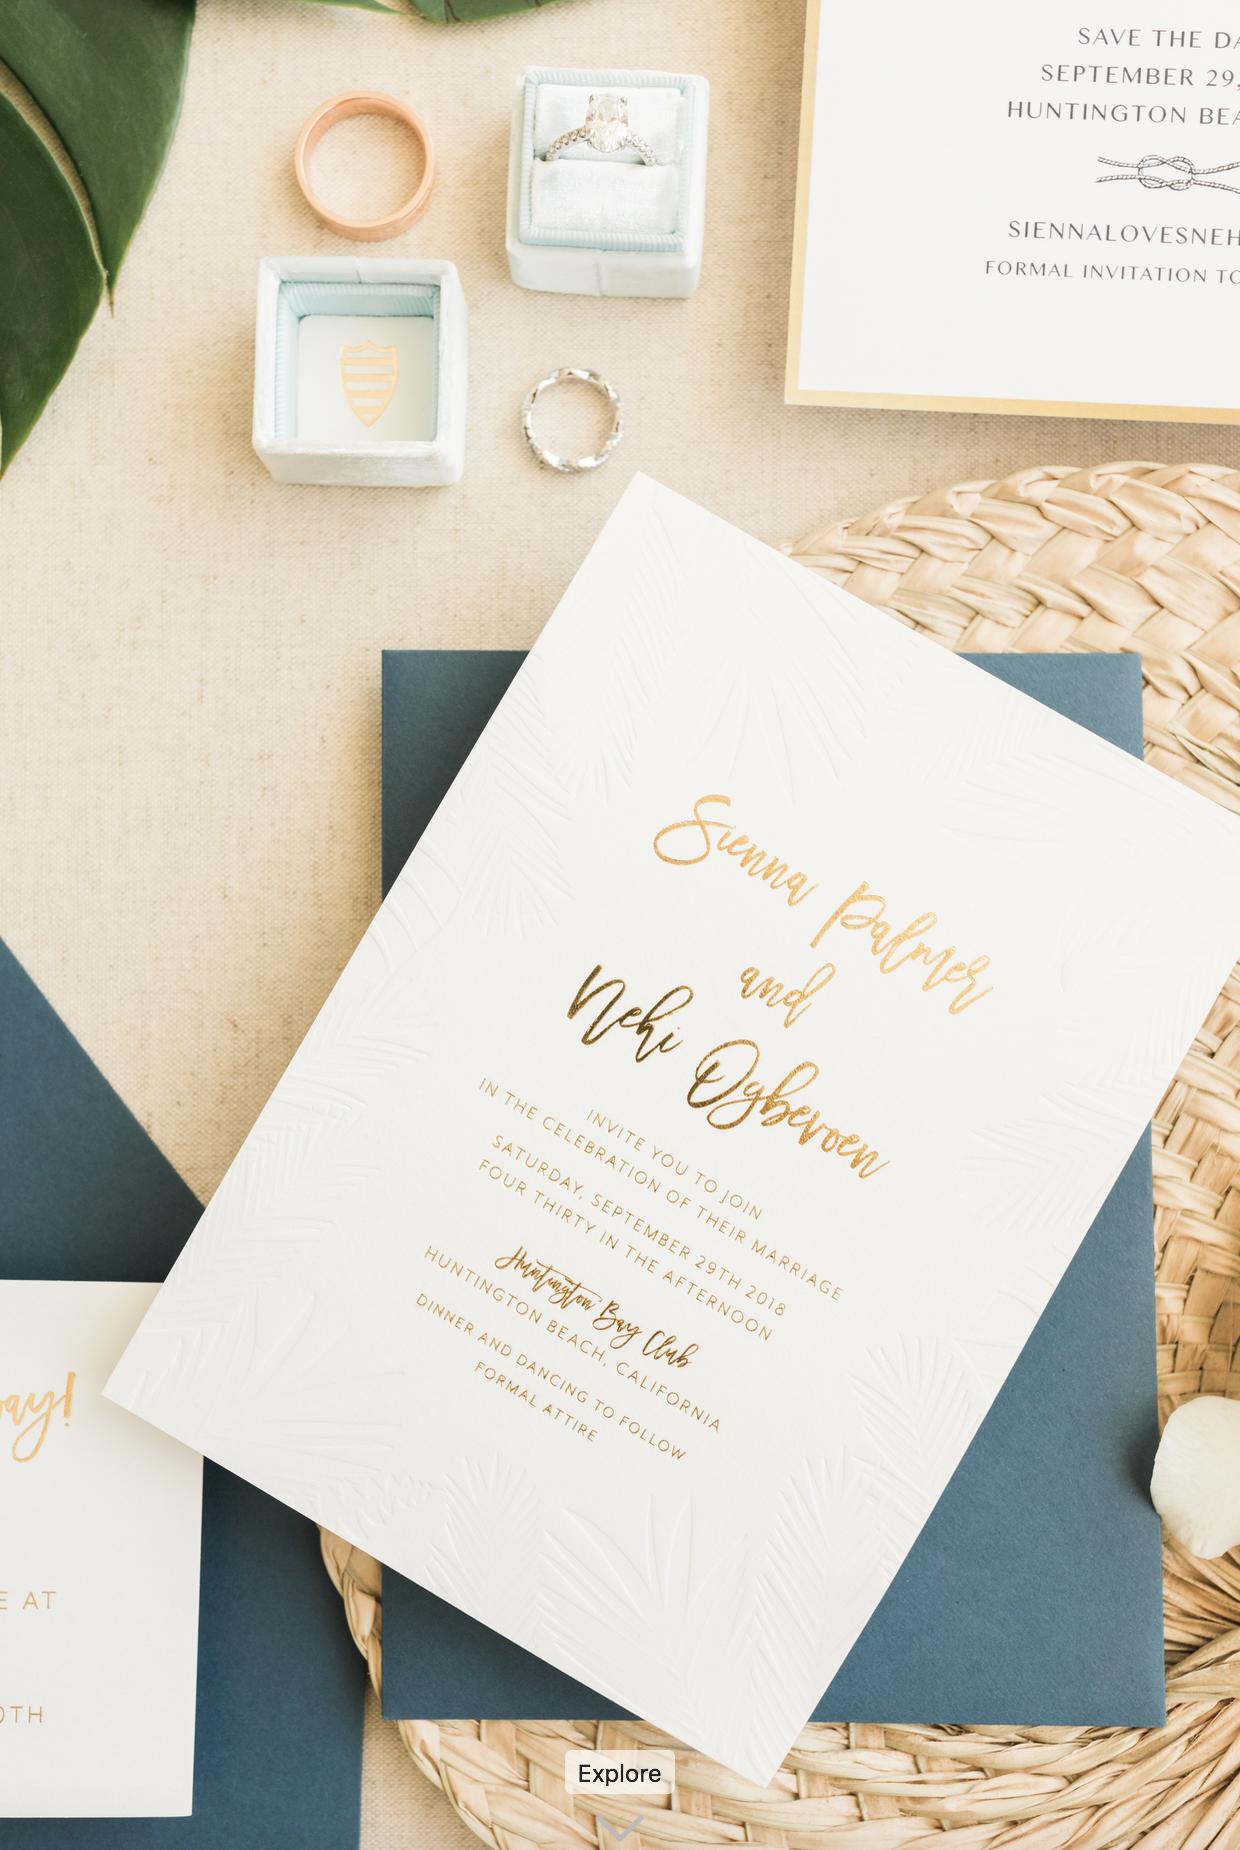 Swell Press Sienna Nehi Letterpress Wedding 1.23.25 PM.png